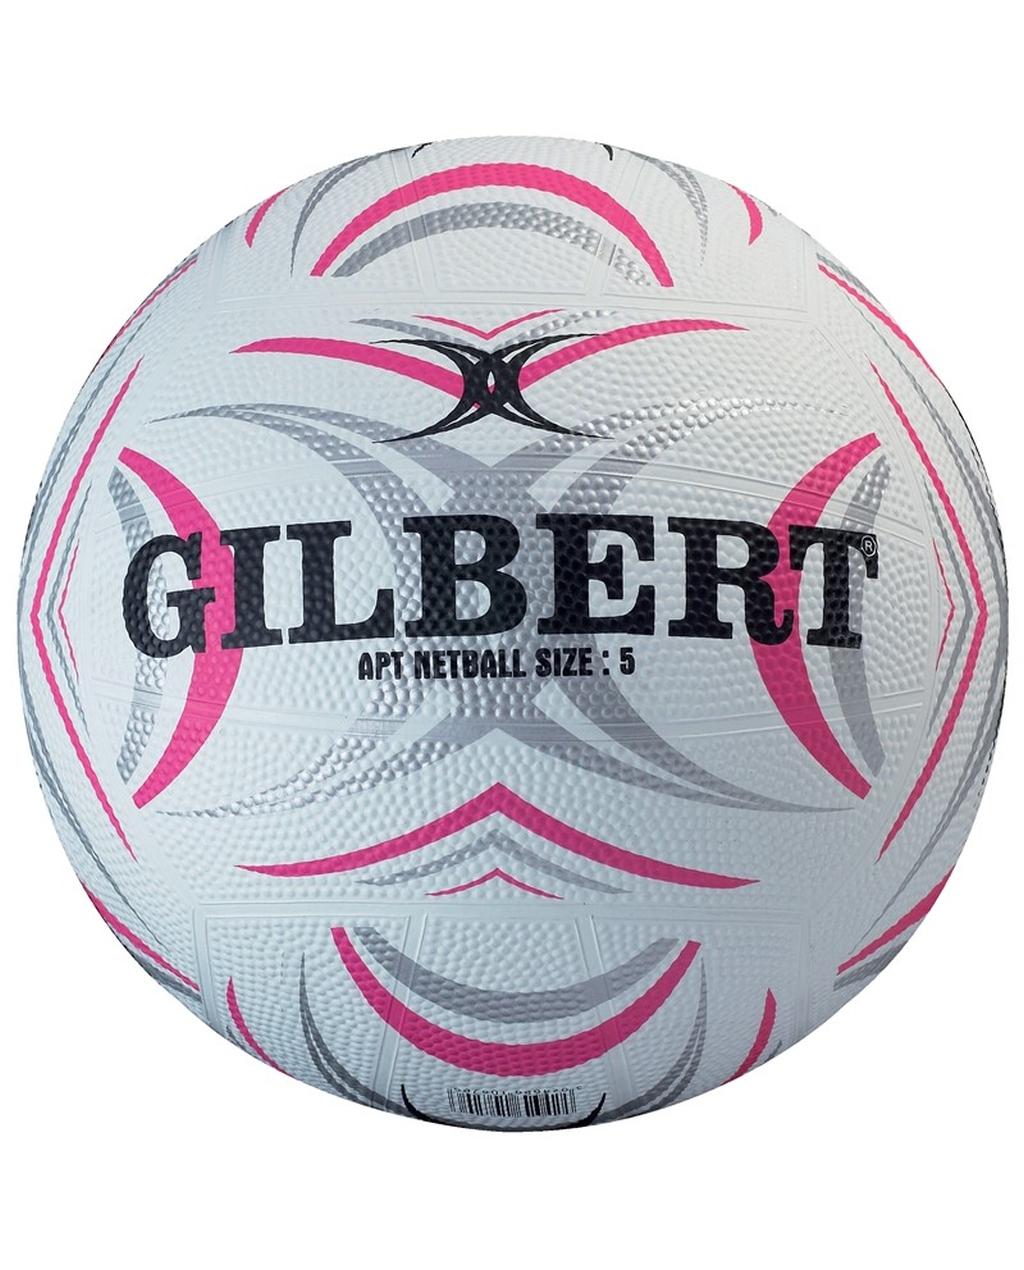 Netball Gilbert ATP S5